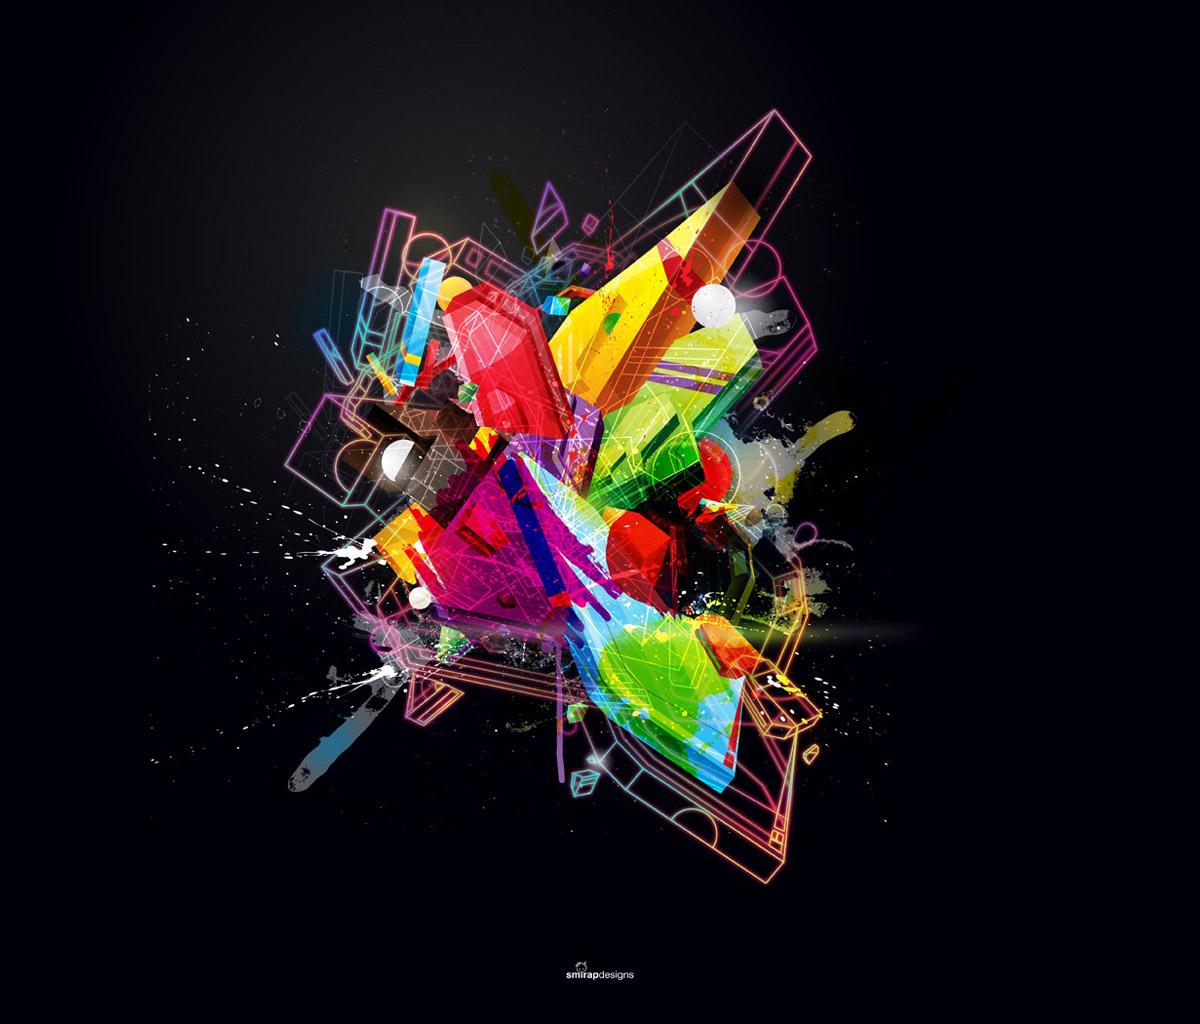 Abstract Tablet Wallpaper -24